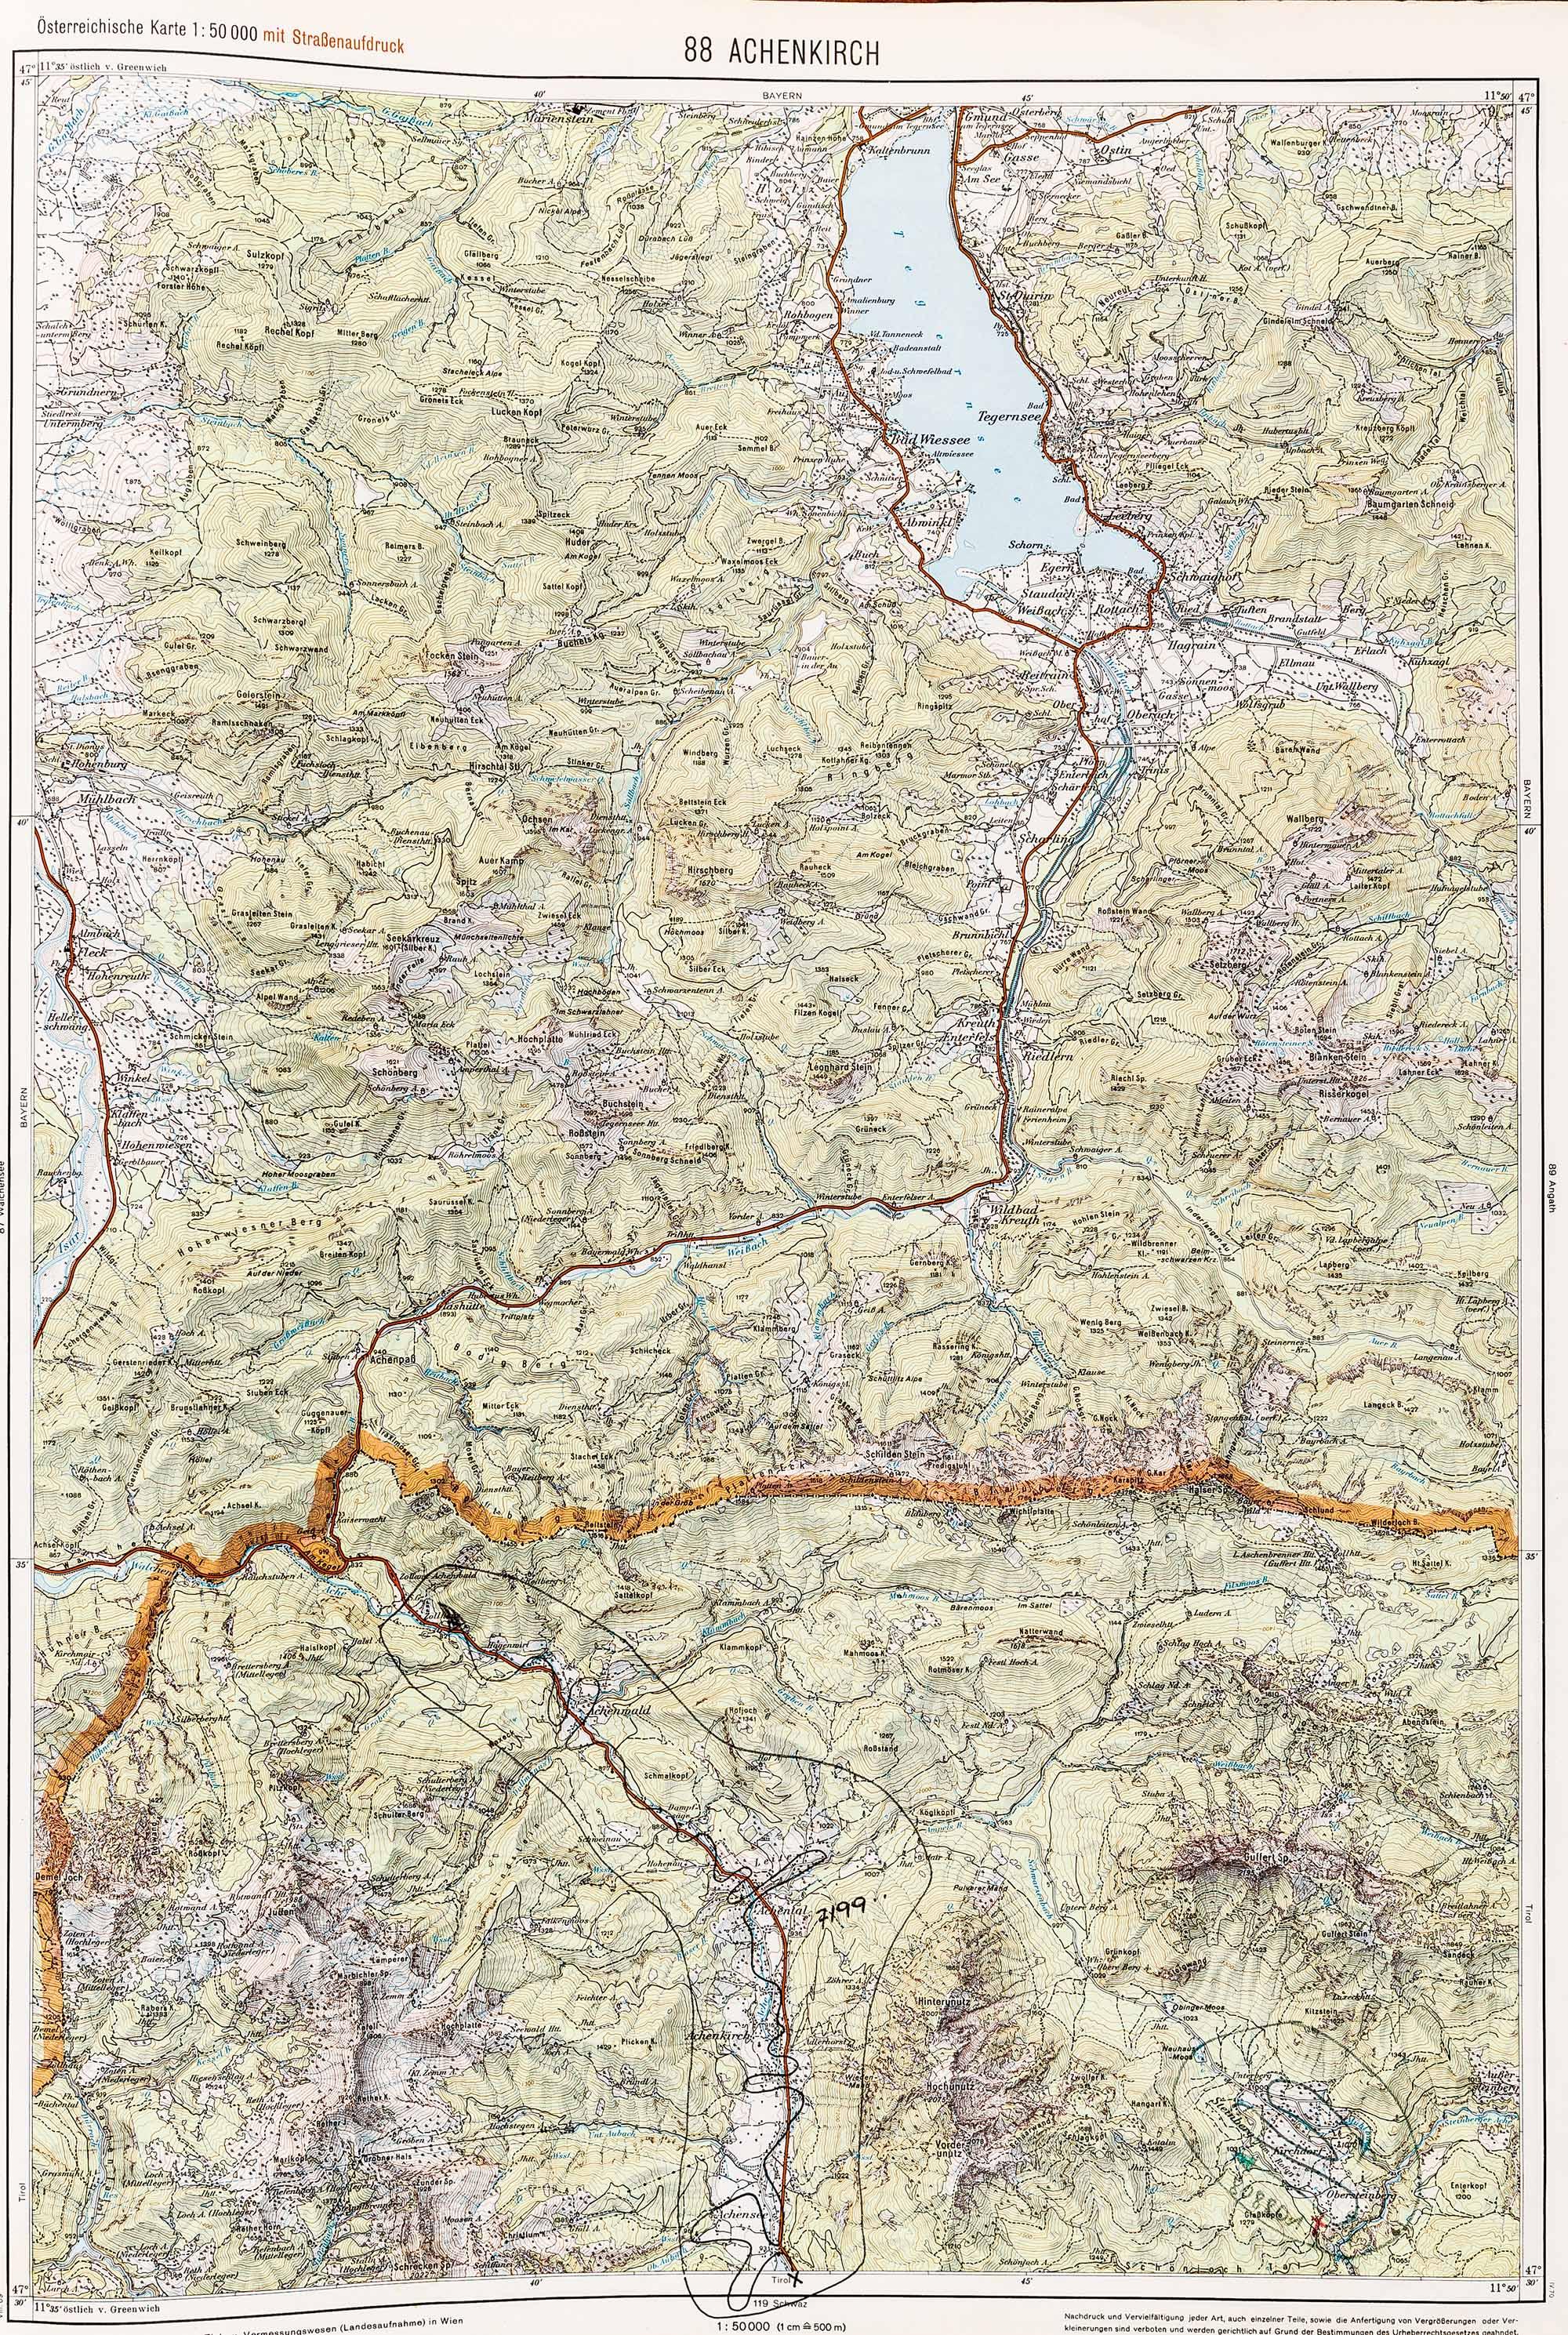 1975-1979 Karte 088